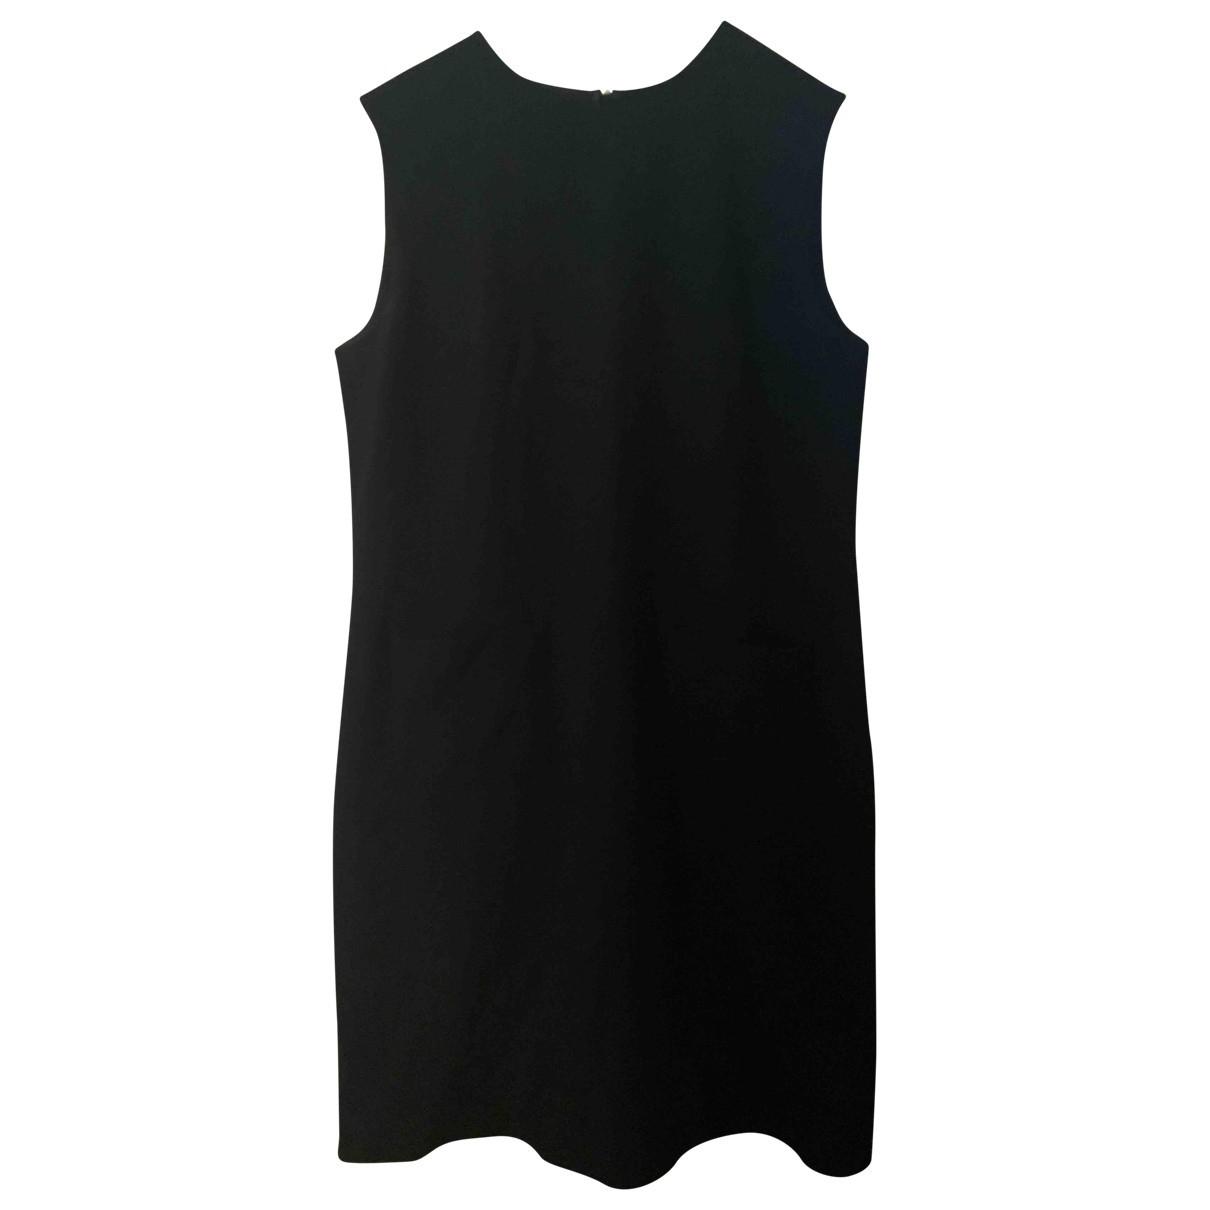 Erdem \N Black Wool dress for Women 12 UK